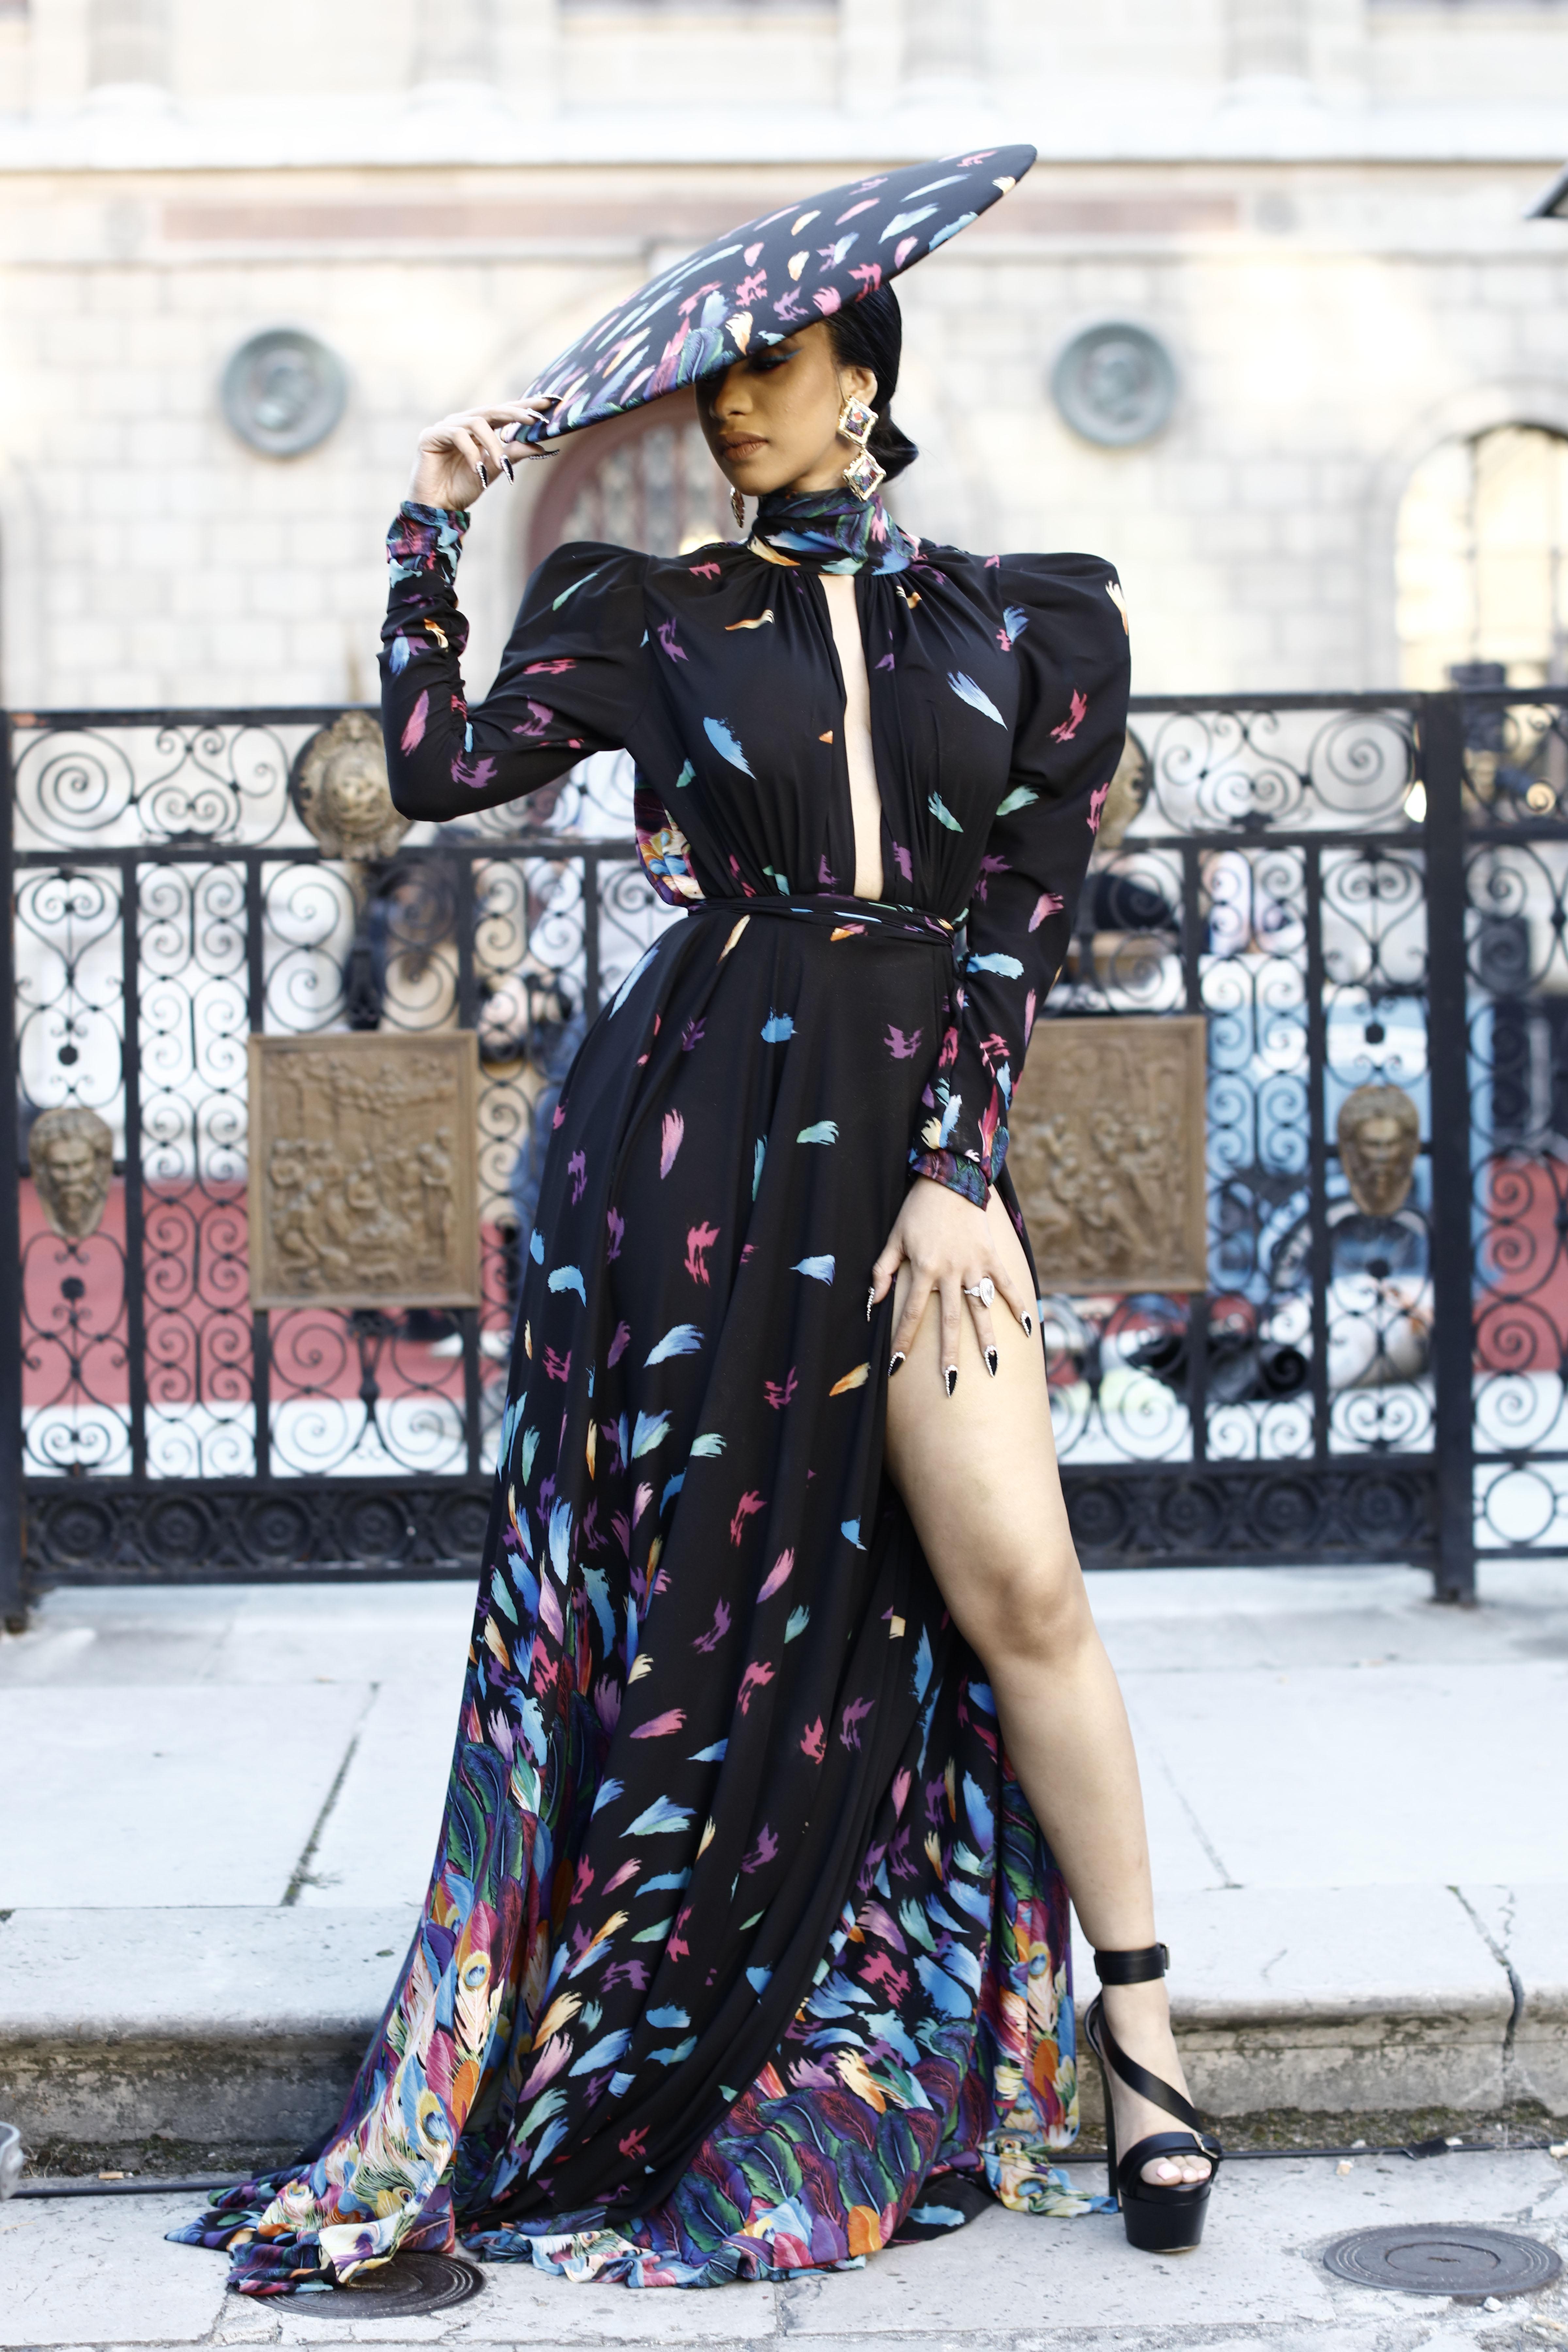 Celebs Paris Fashion Week - Cardi B, Bella Hadid, Cindy Crawford